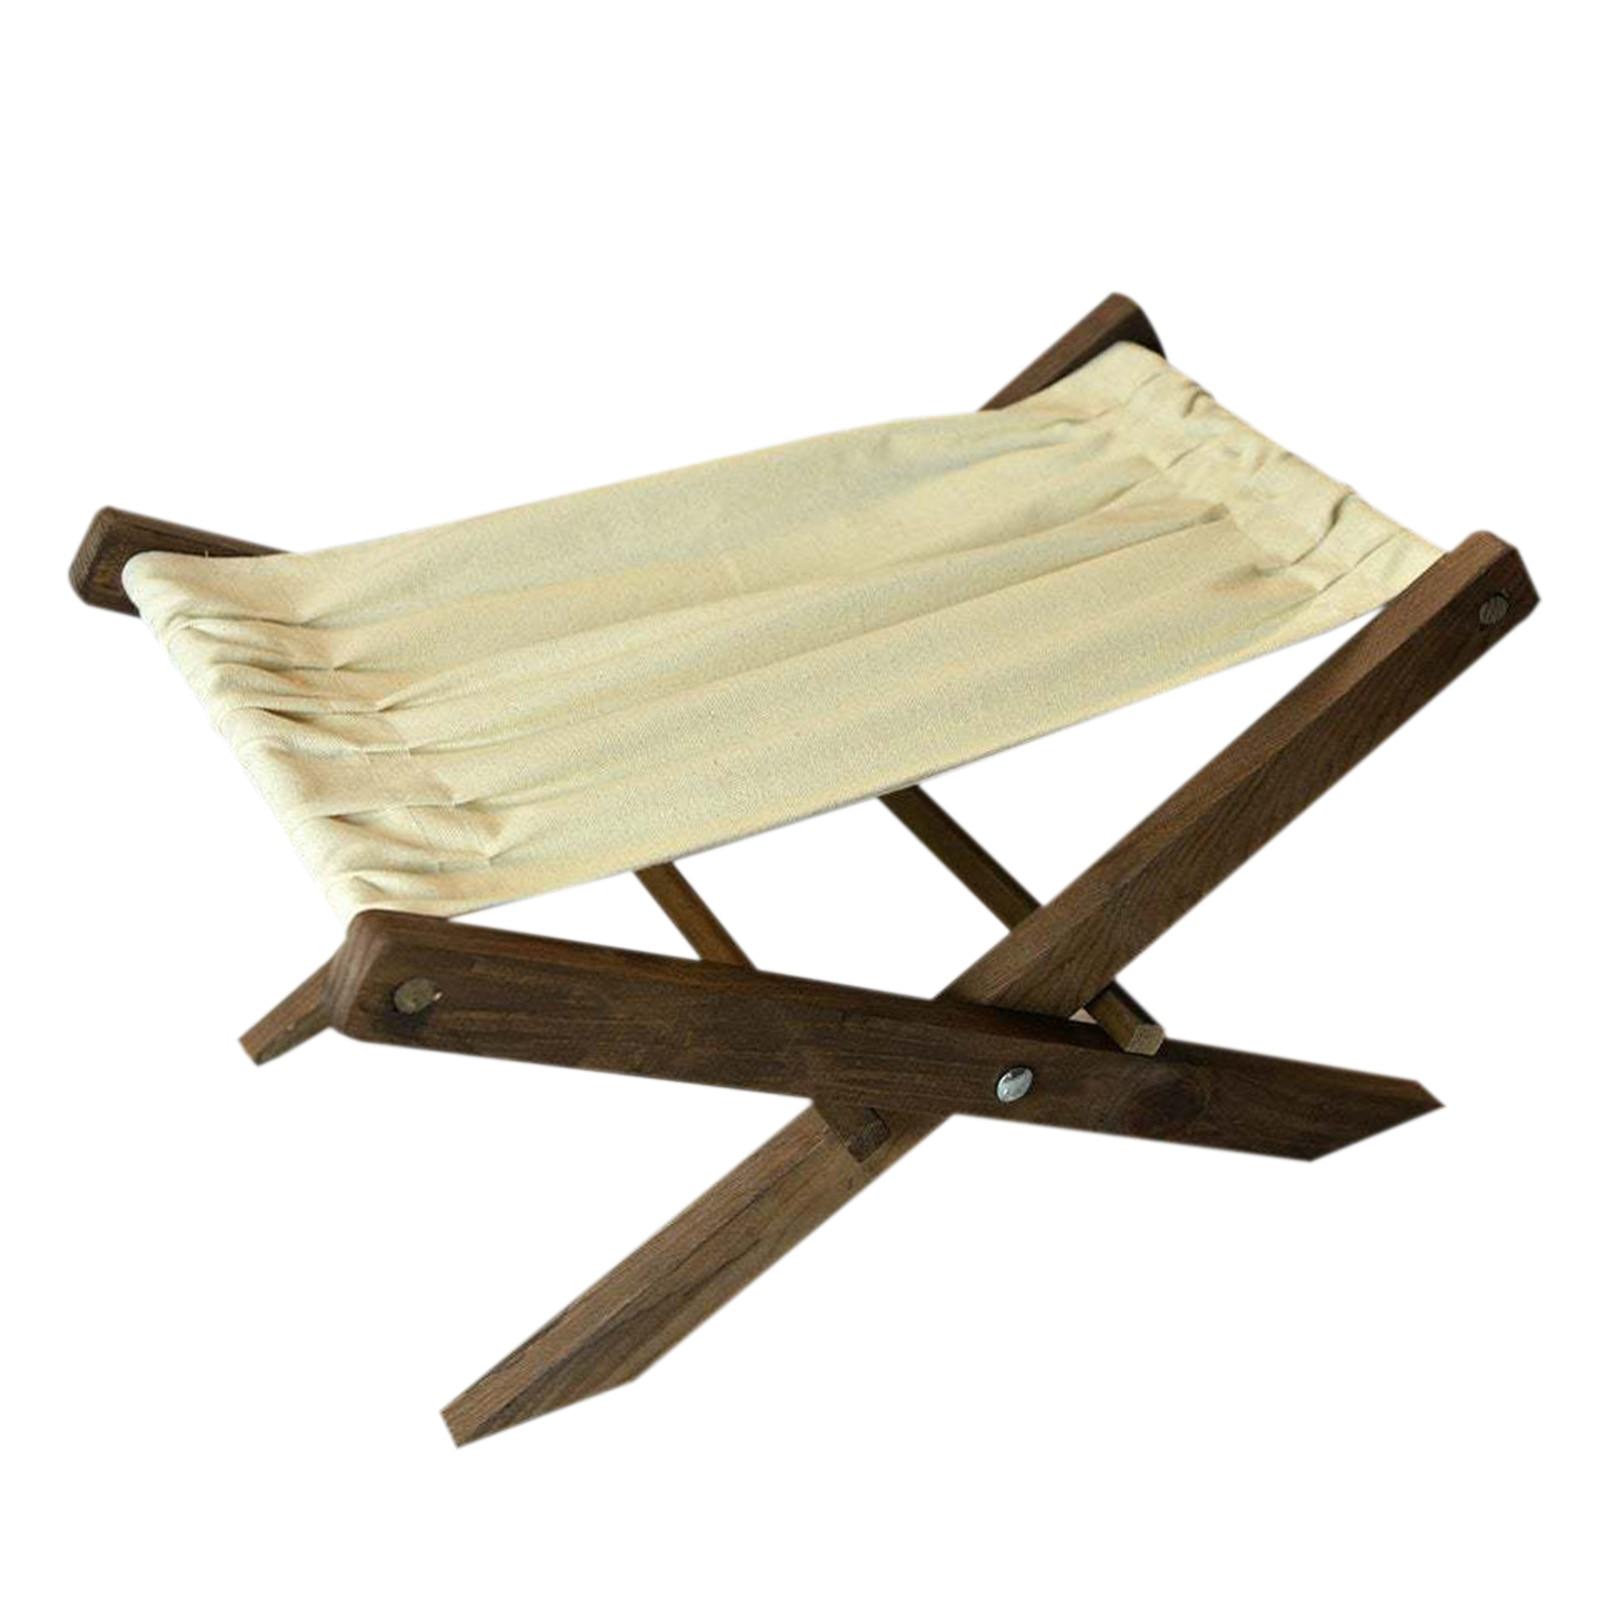 Retro Folding Chair Photography Props Newborn Baby Photo Props Chair For Photography Accessories